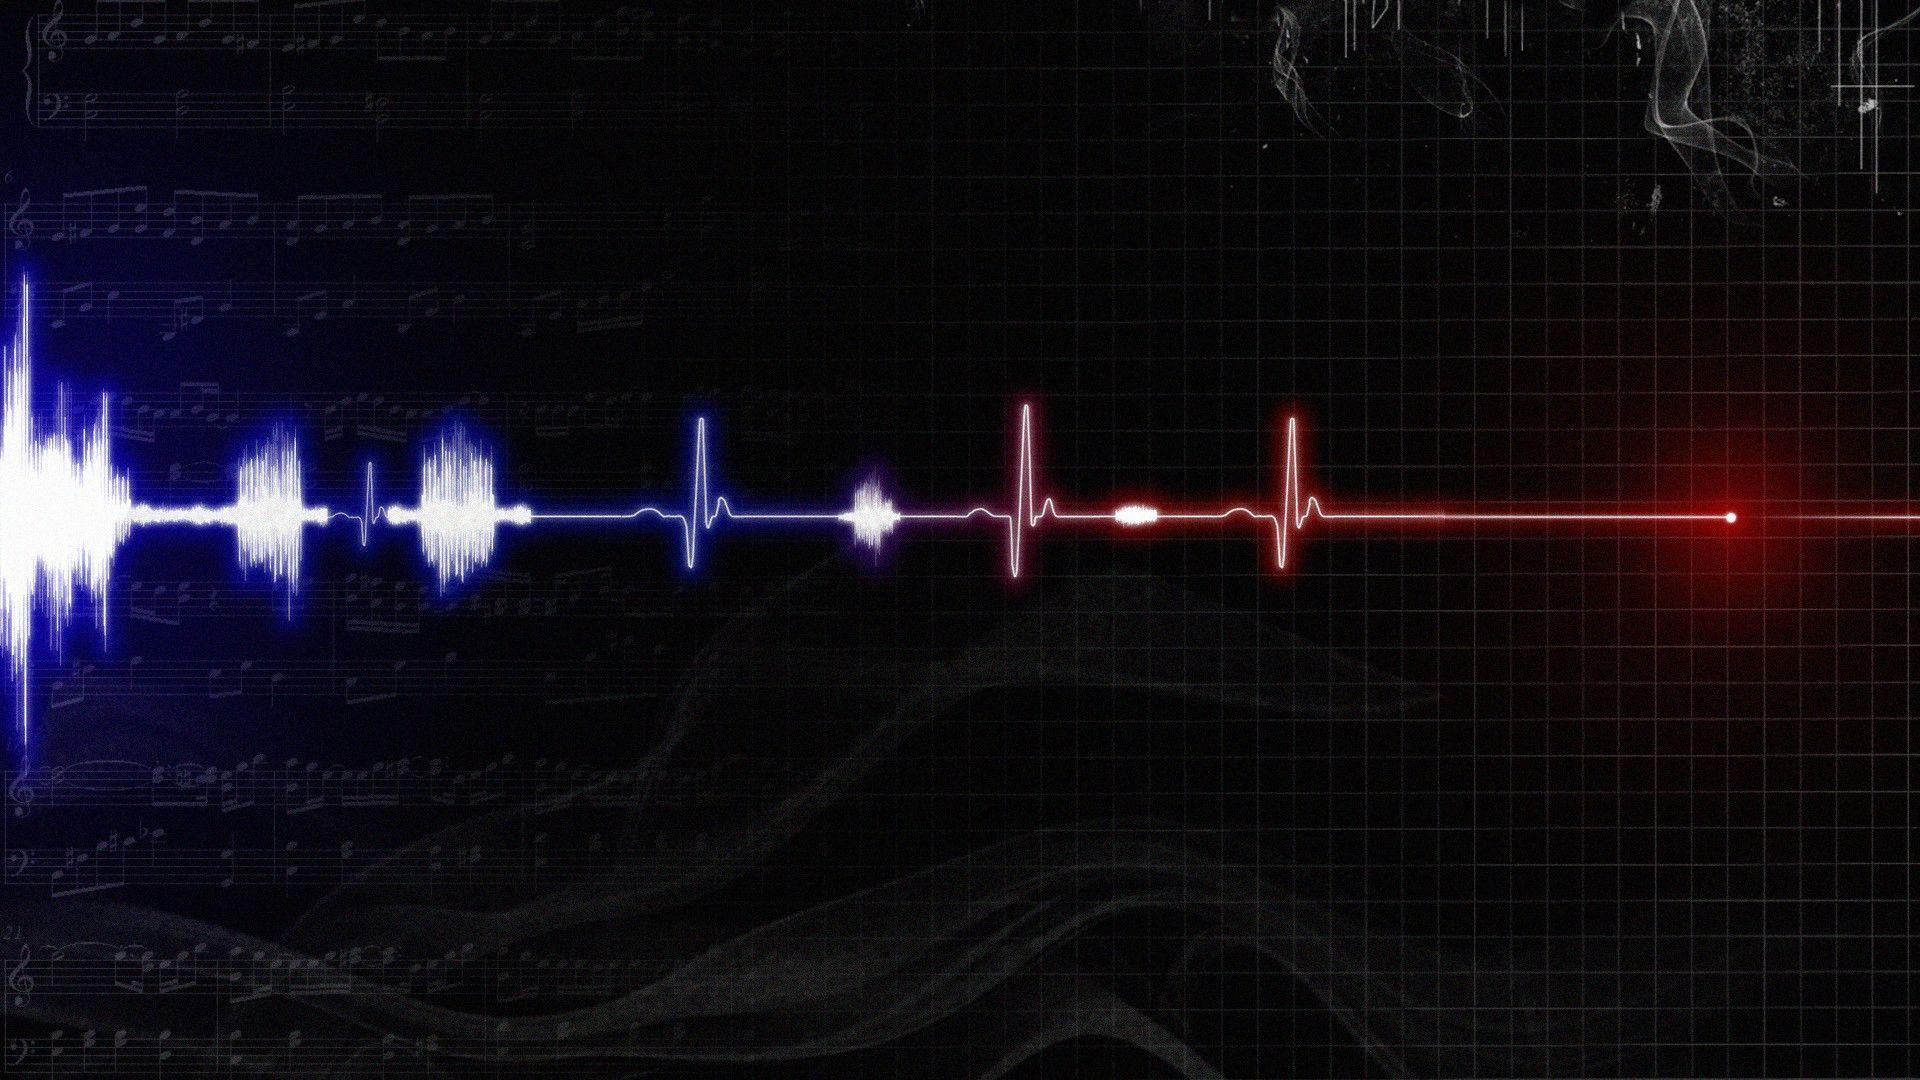 Soundwave Wallpapers 1920x1080